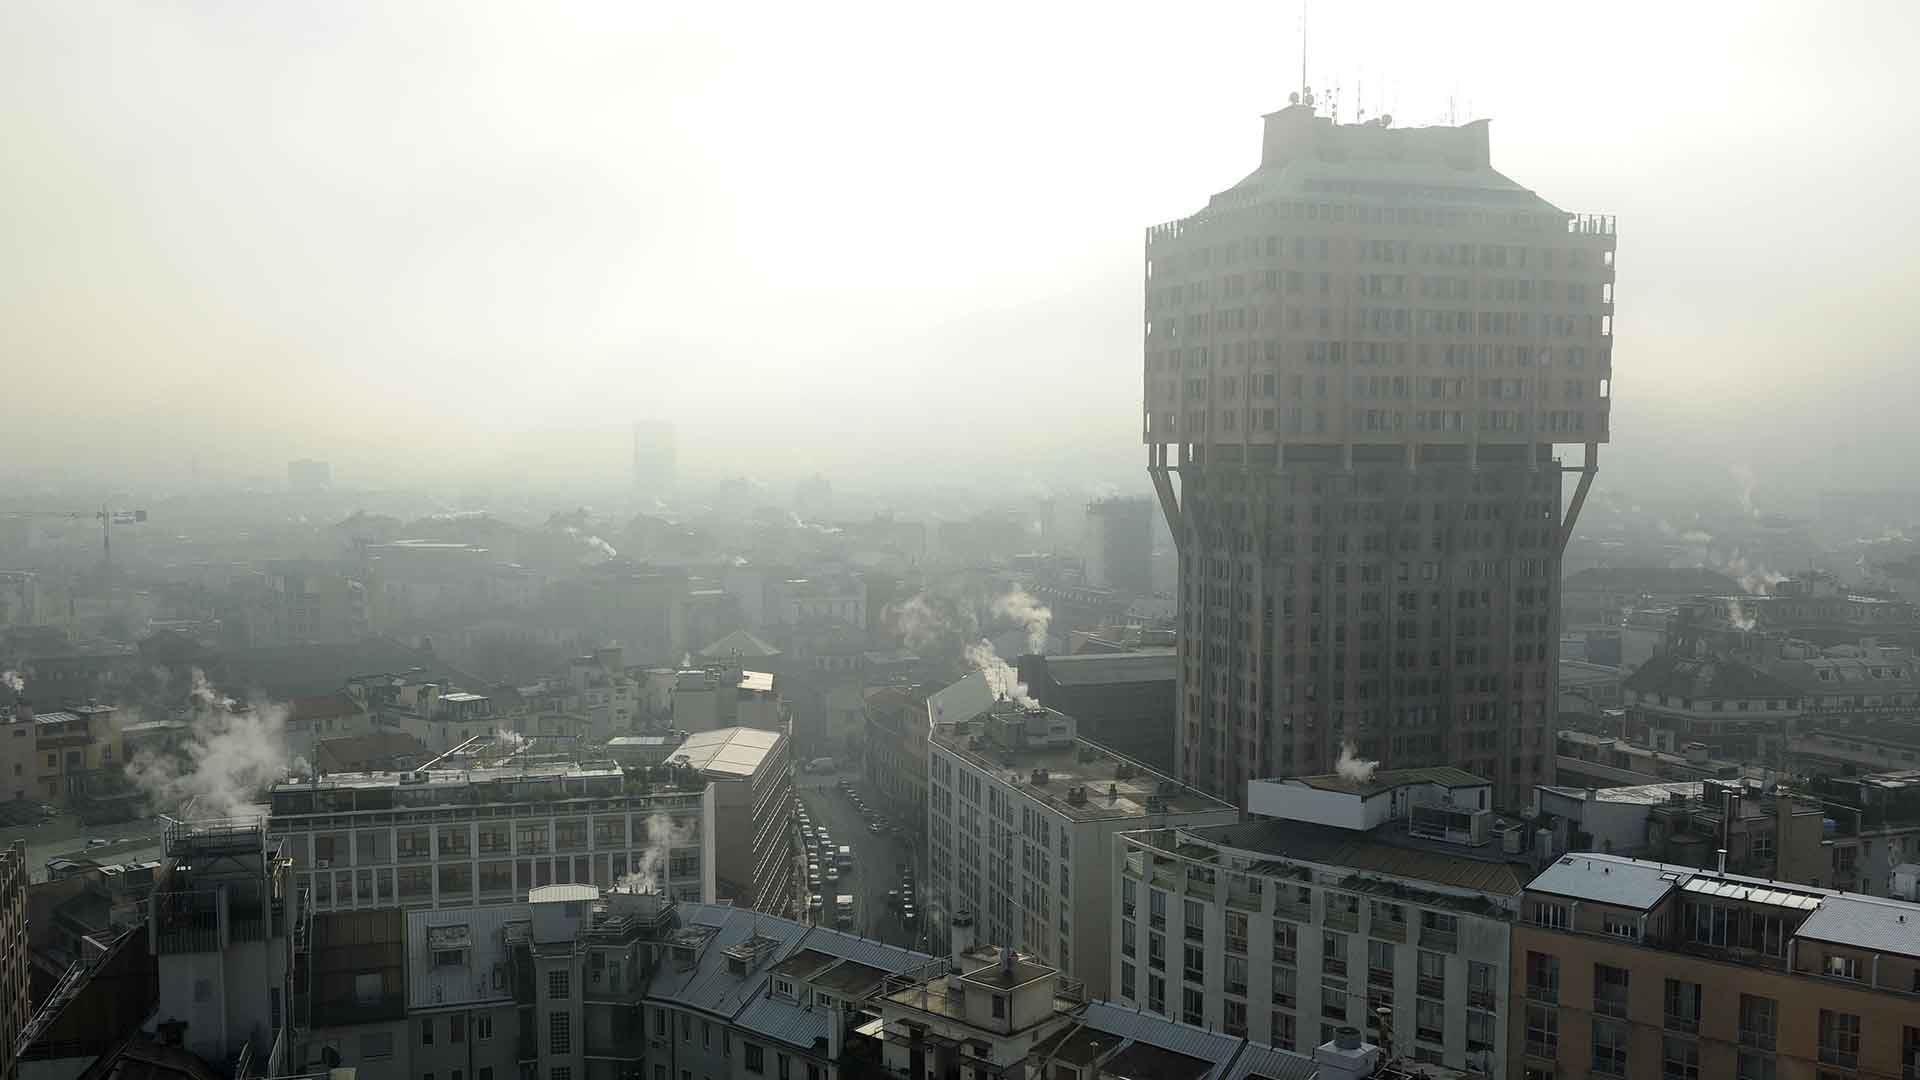 Air pollution in Milan